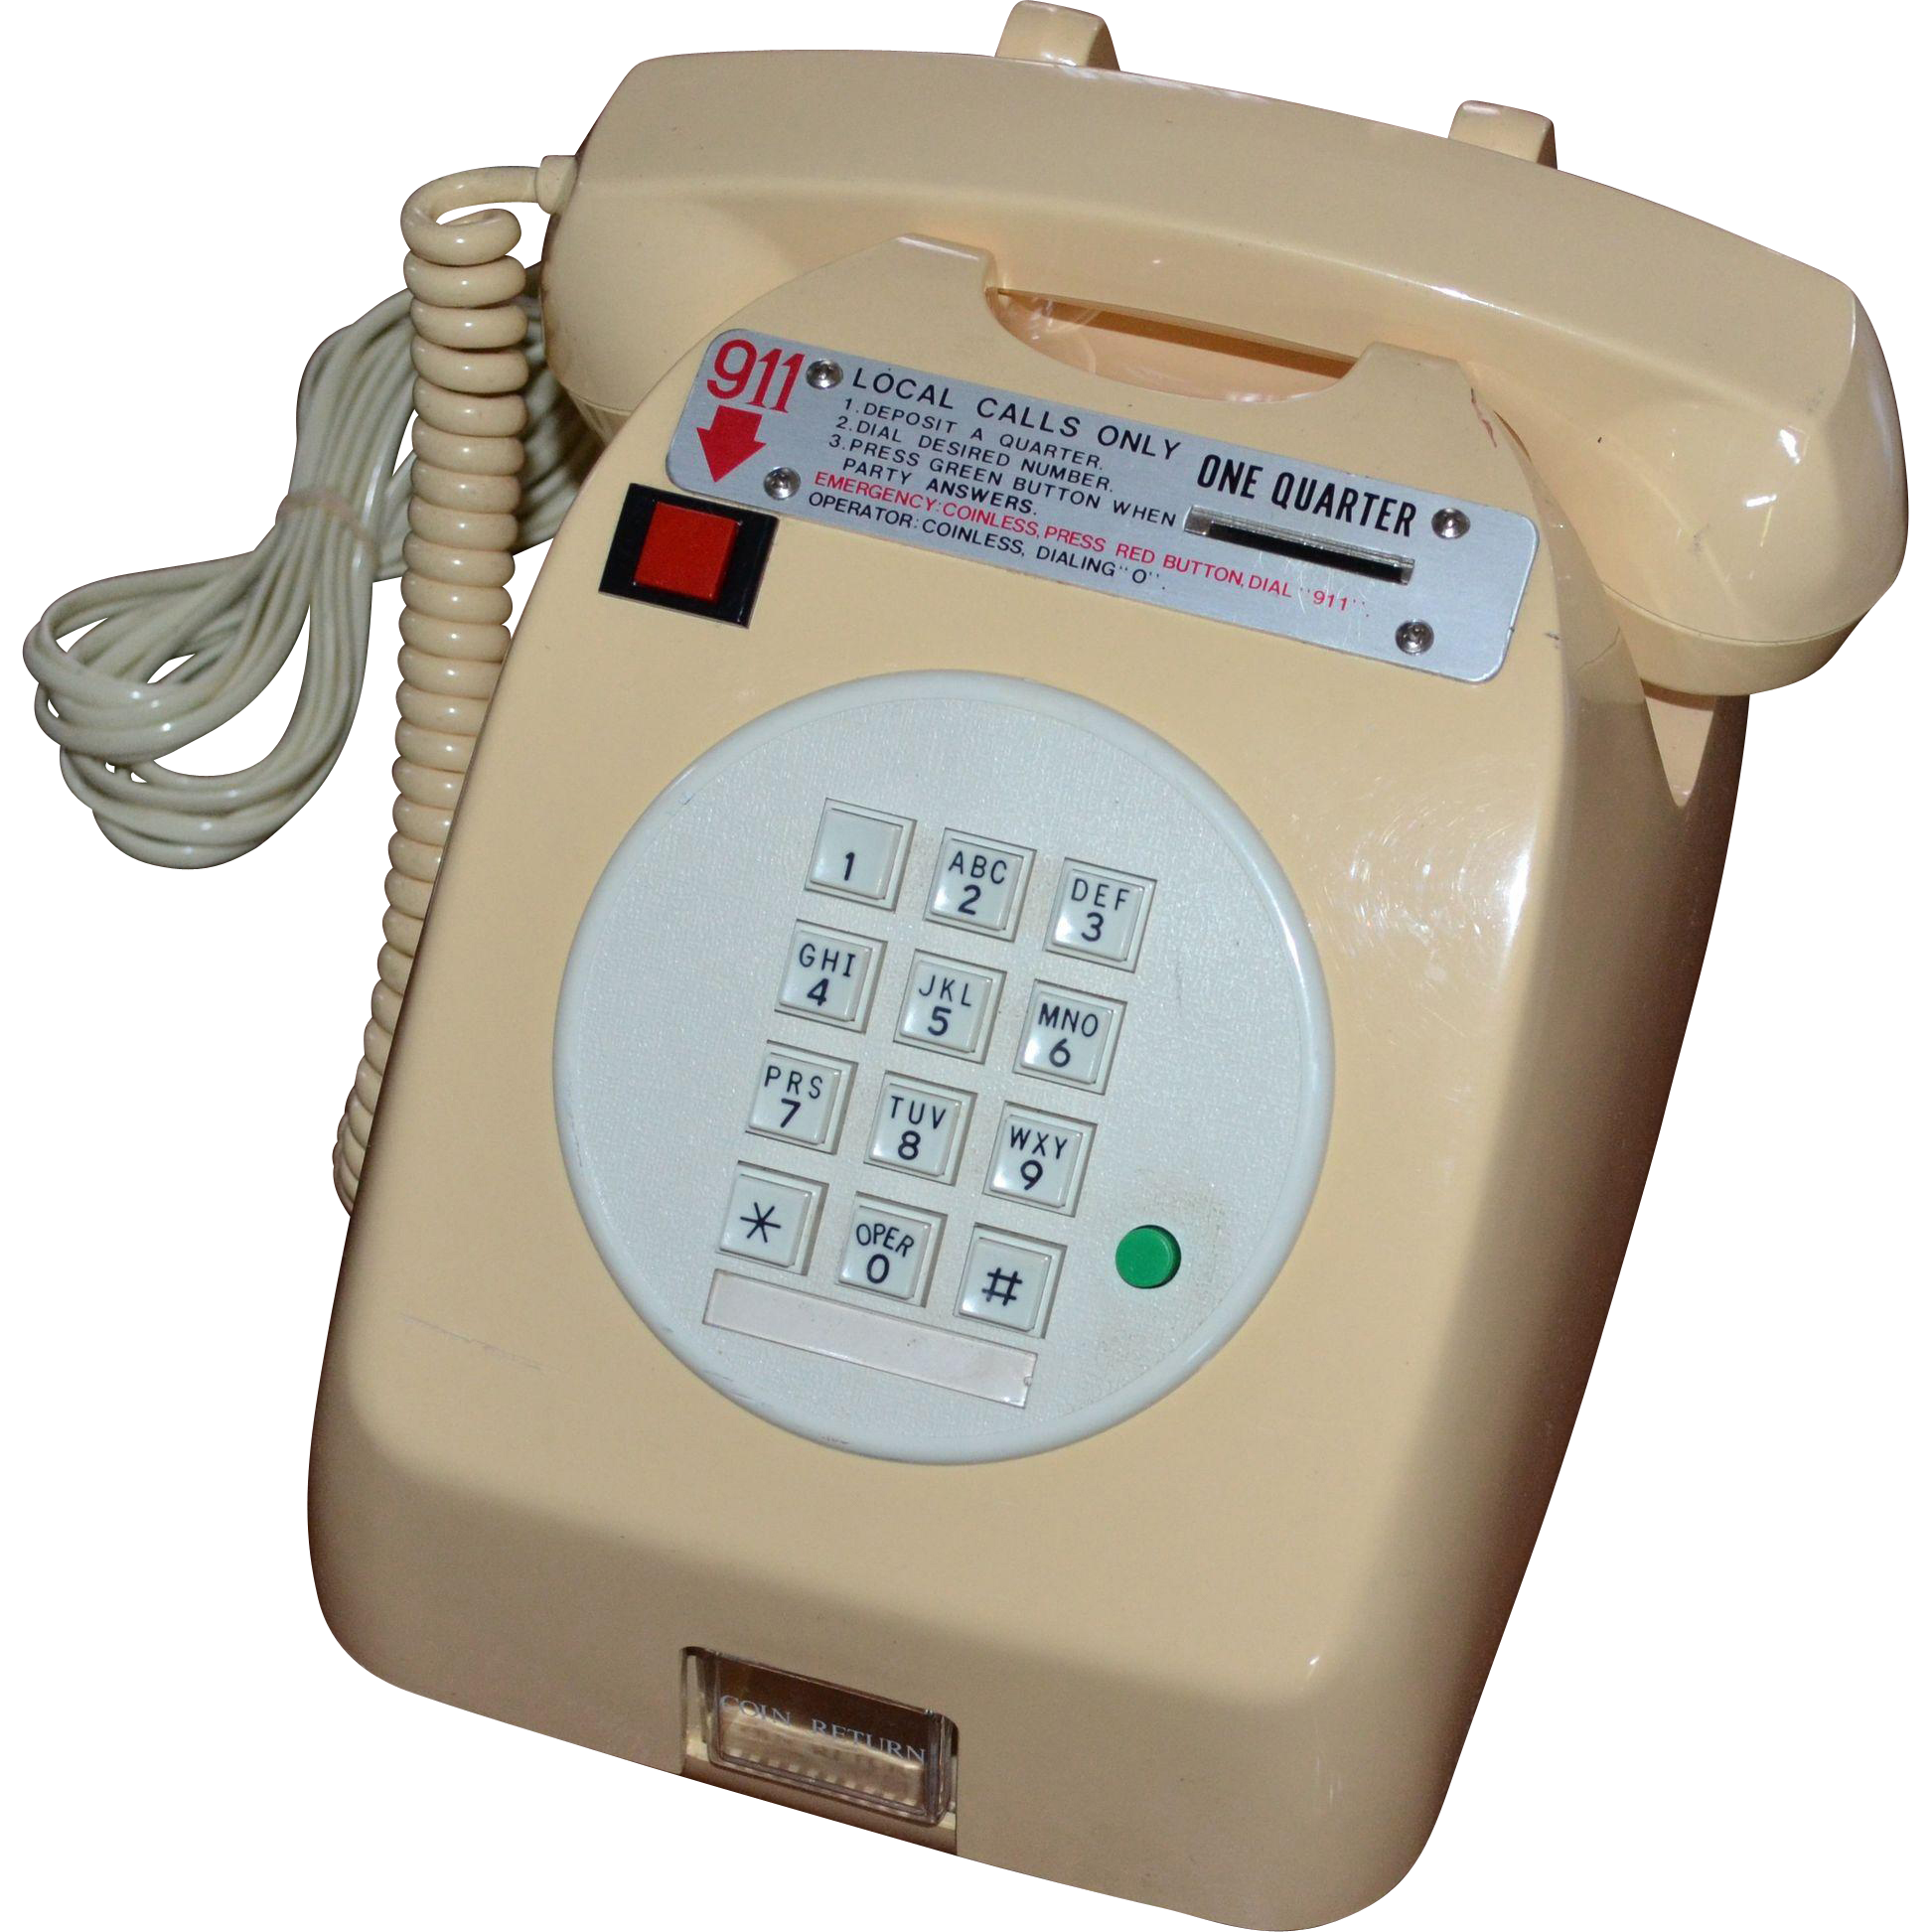 Locking 25 Cent Hotel Pay Phone Tongya Telecommunication Telephone Kitsch Couture Ruby Lane